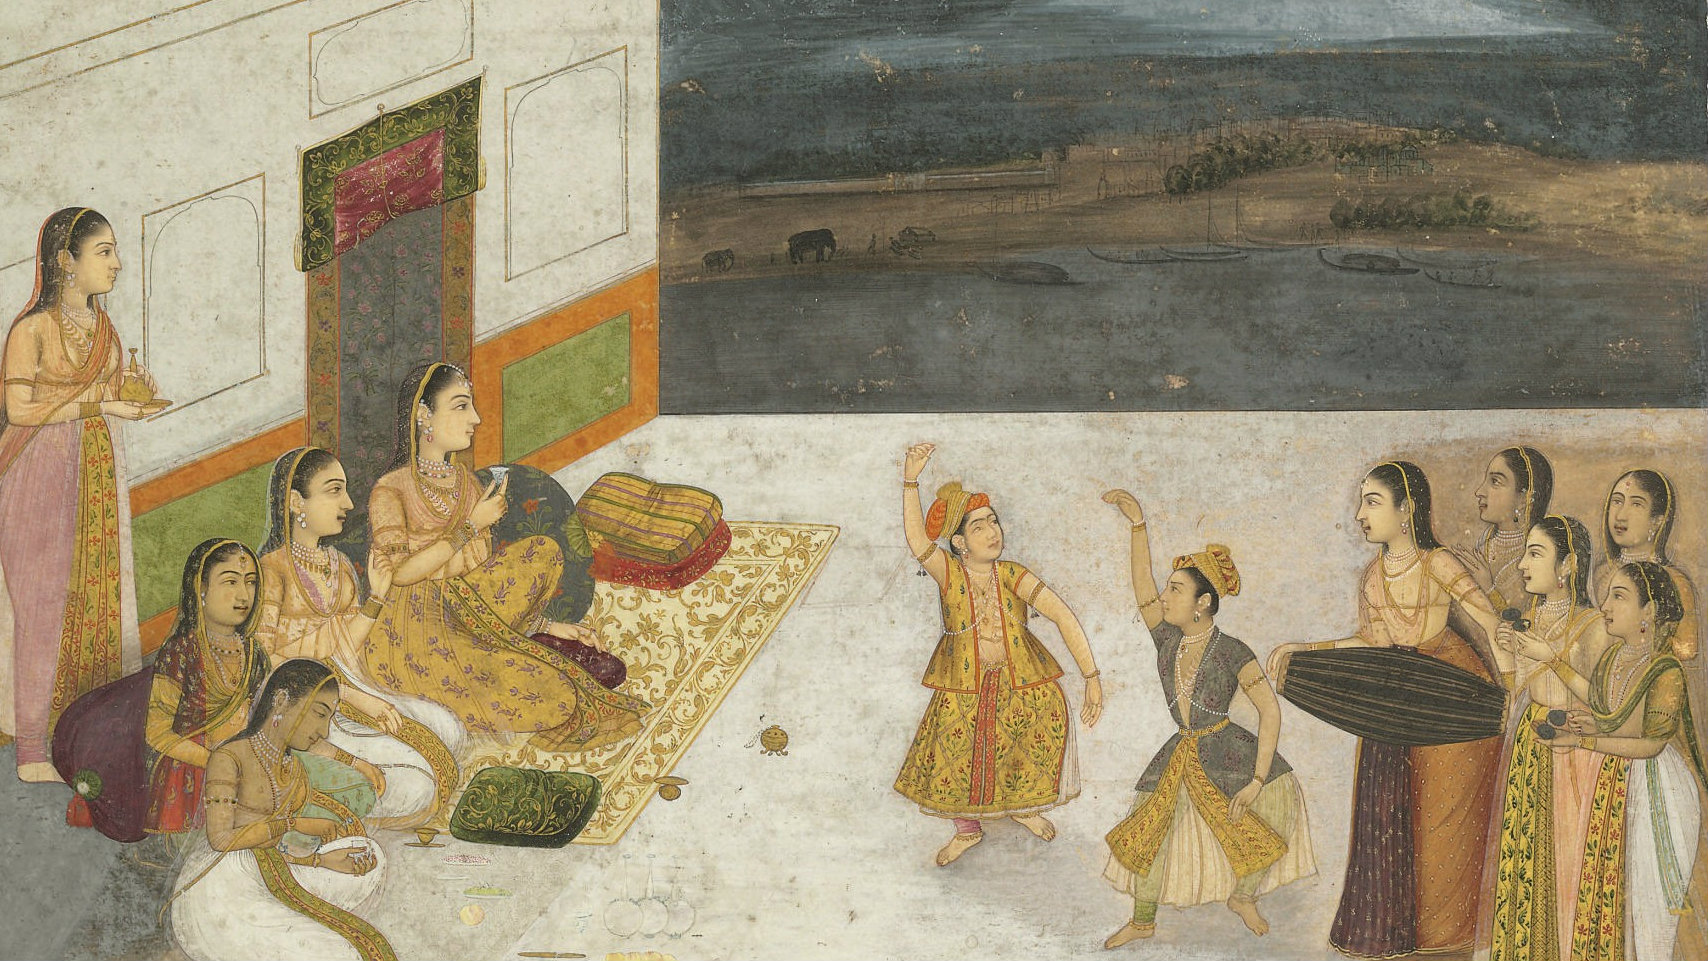 India-history-women